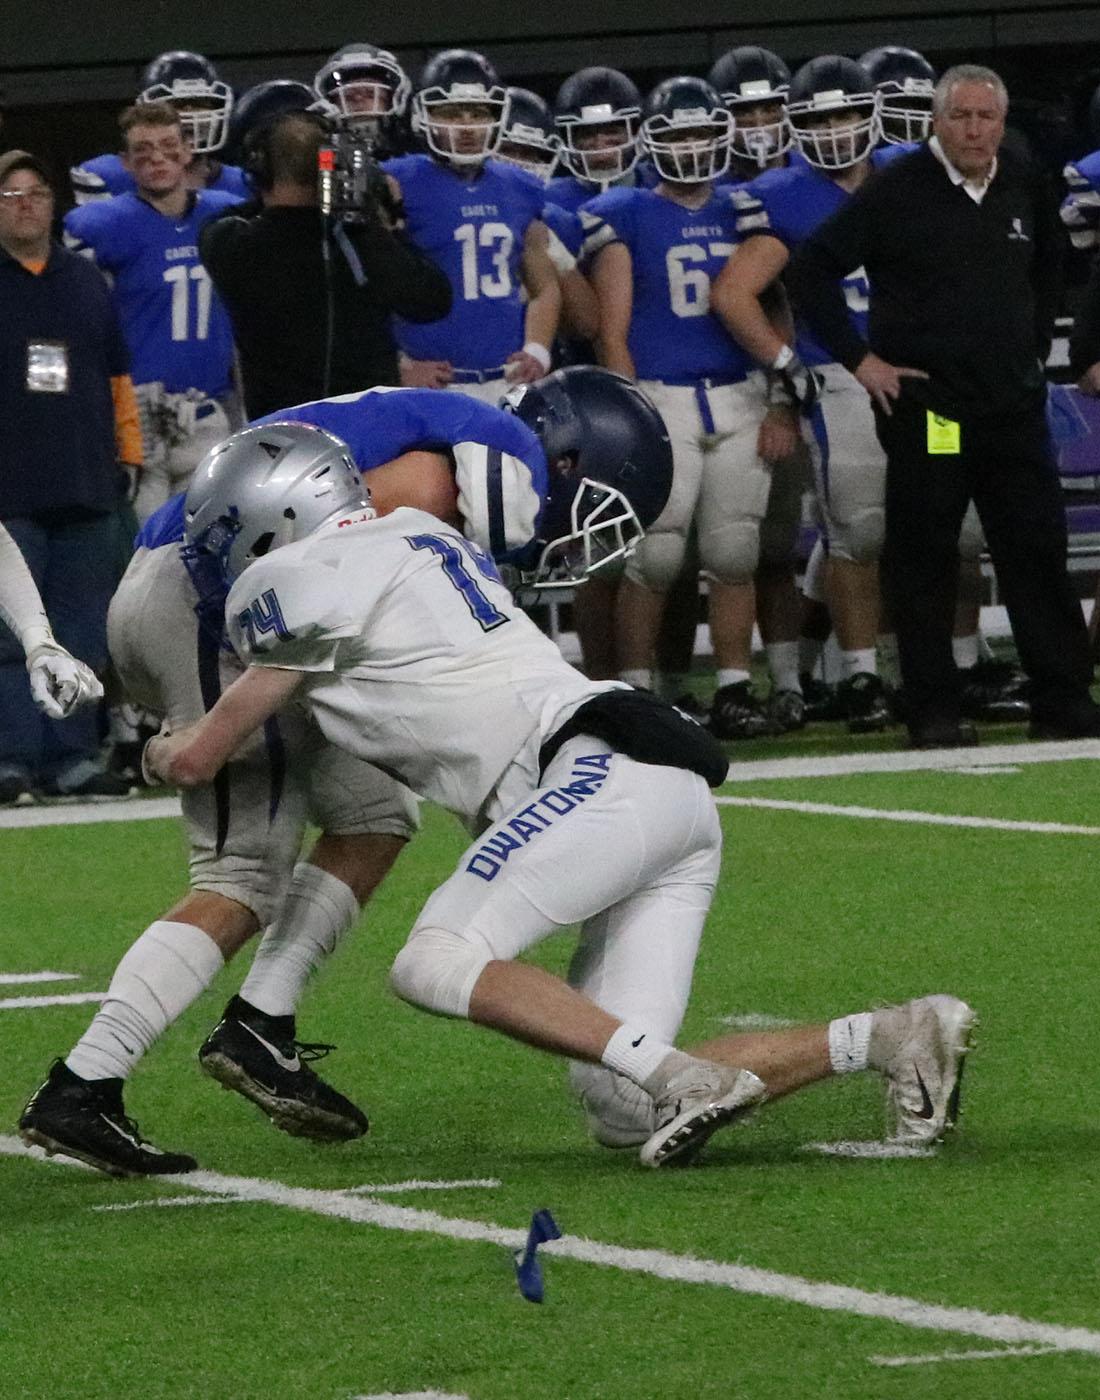 Mason+Rhoades+makes+a+tackle+on++the+punt